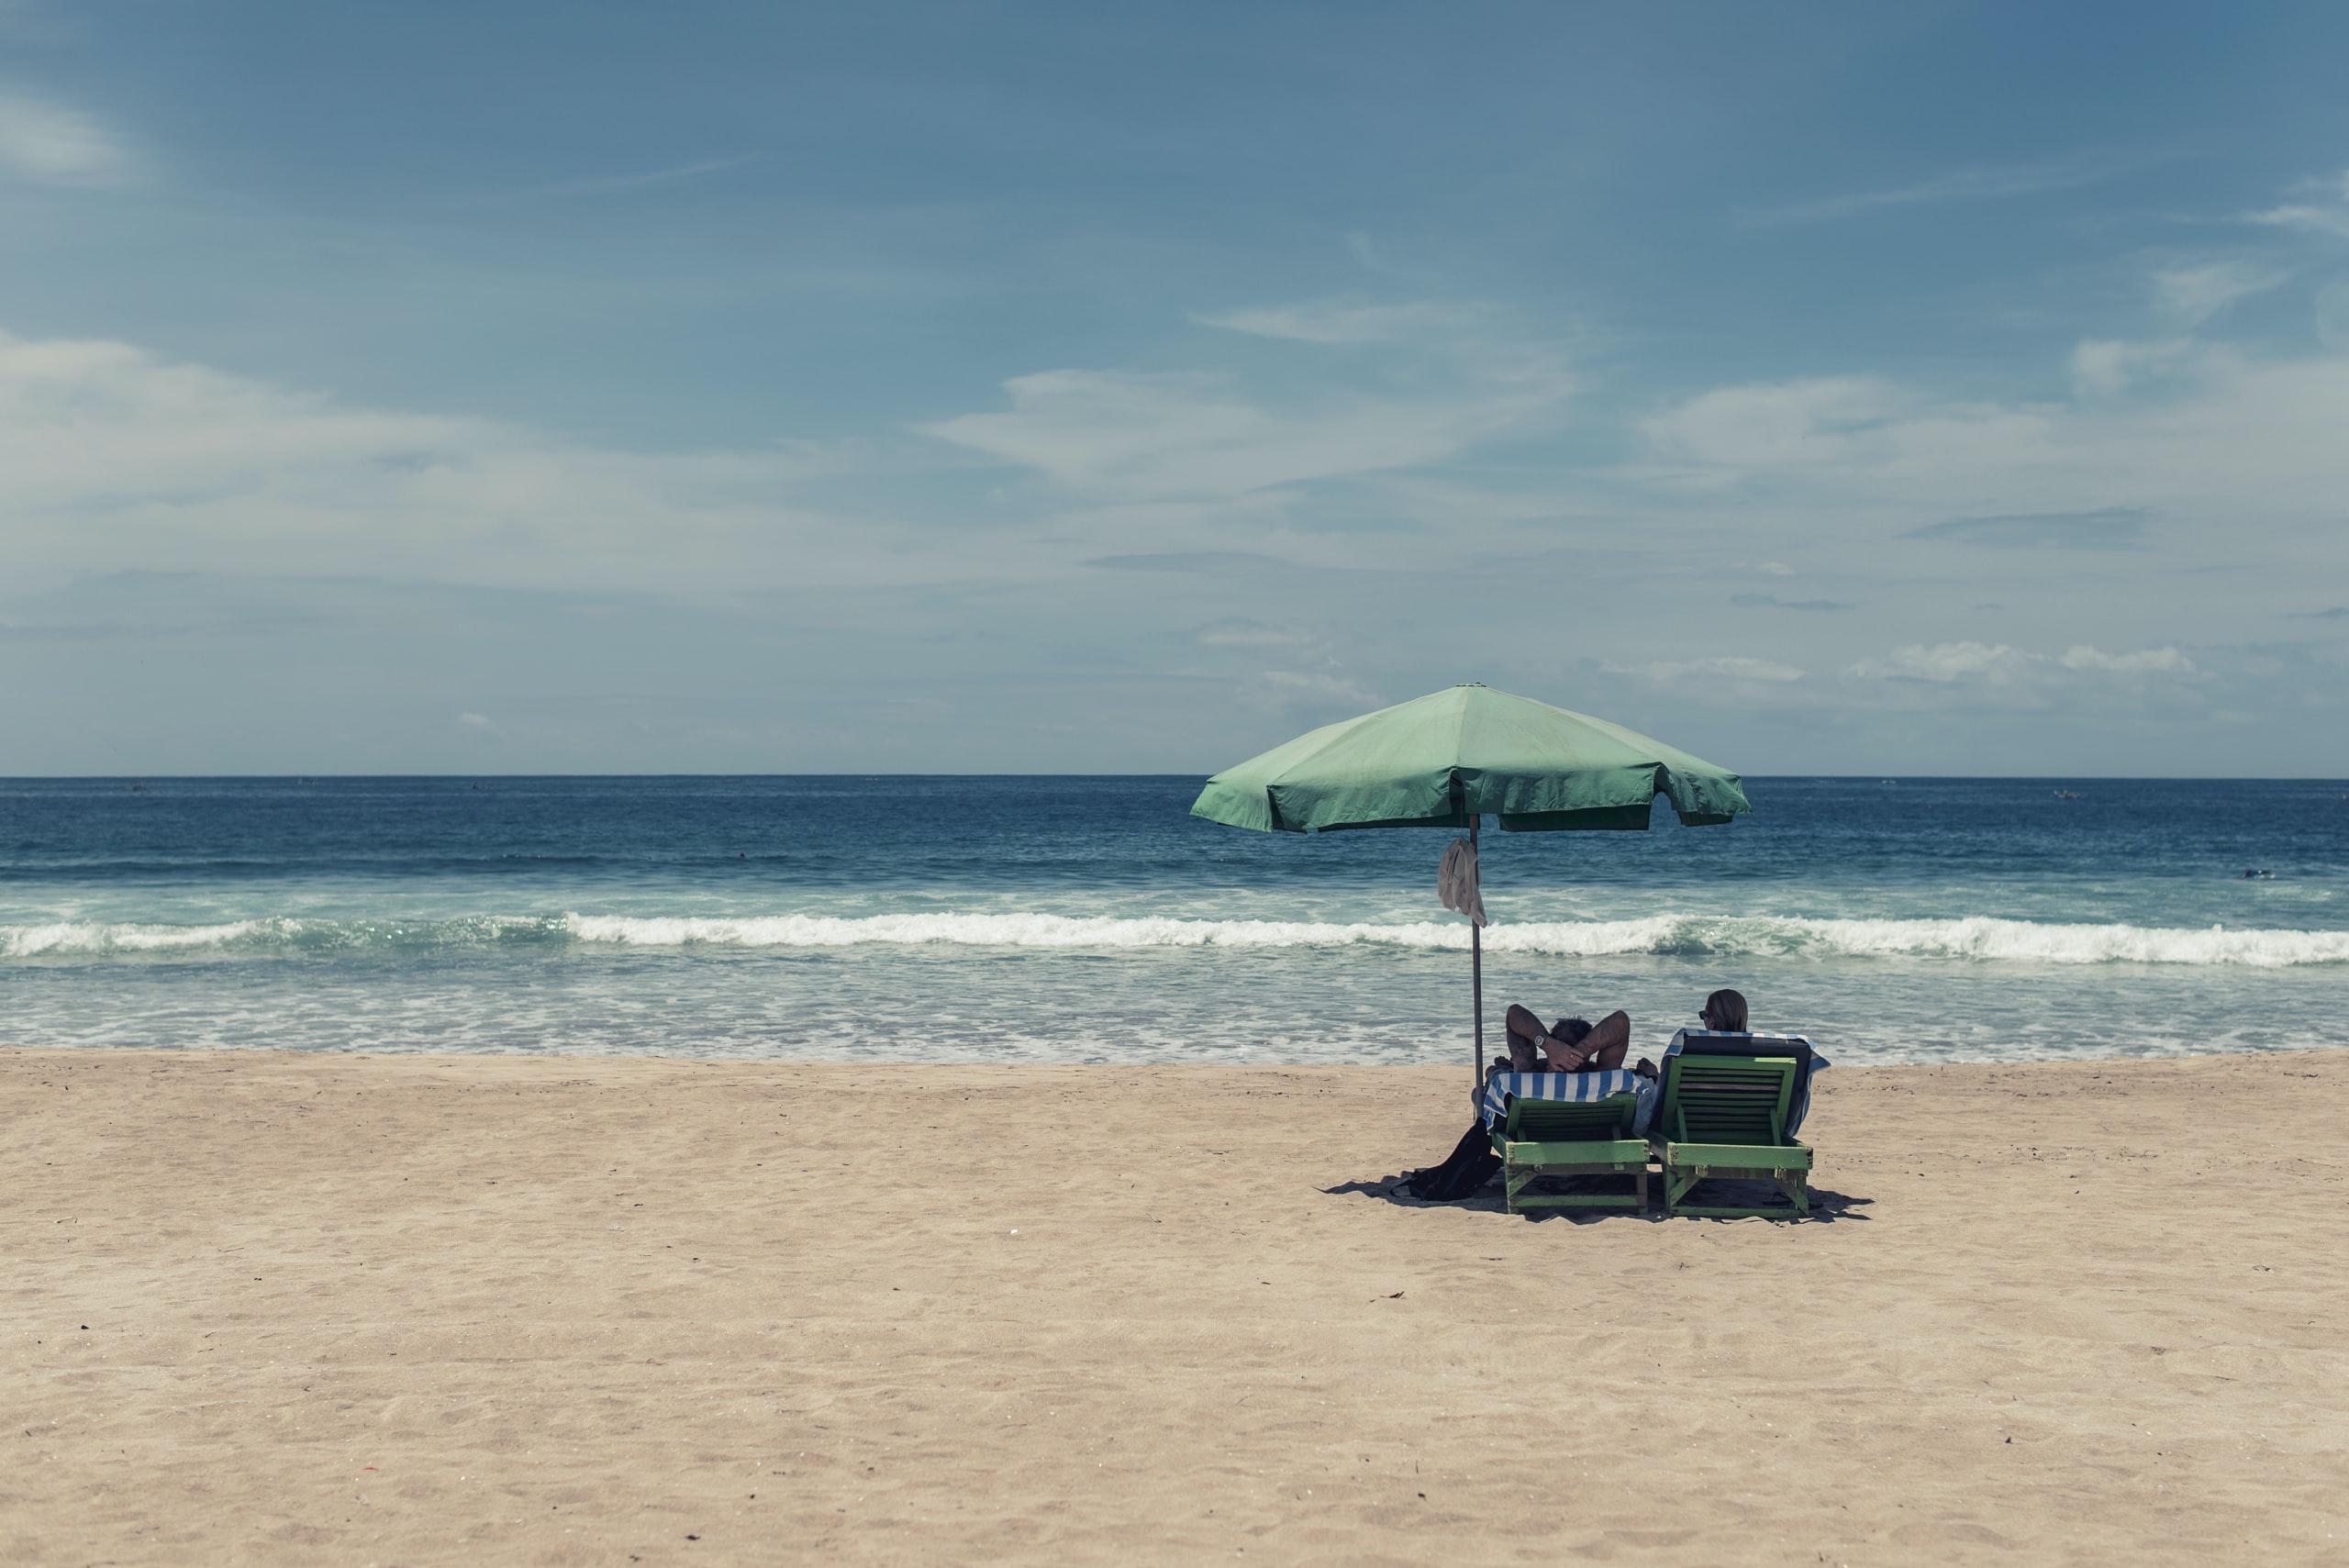 2 people sitting beach chairs under an umbrella on the beach